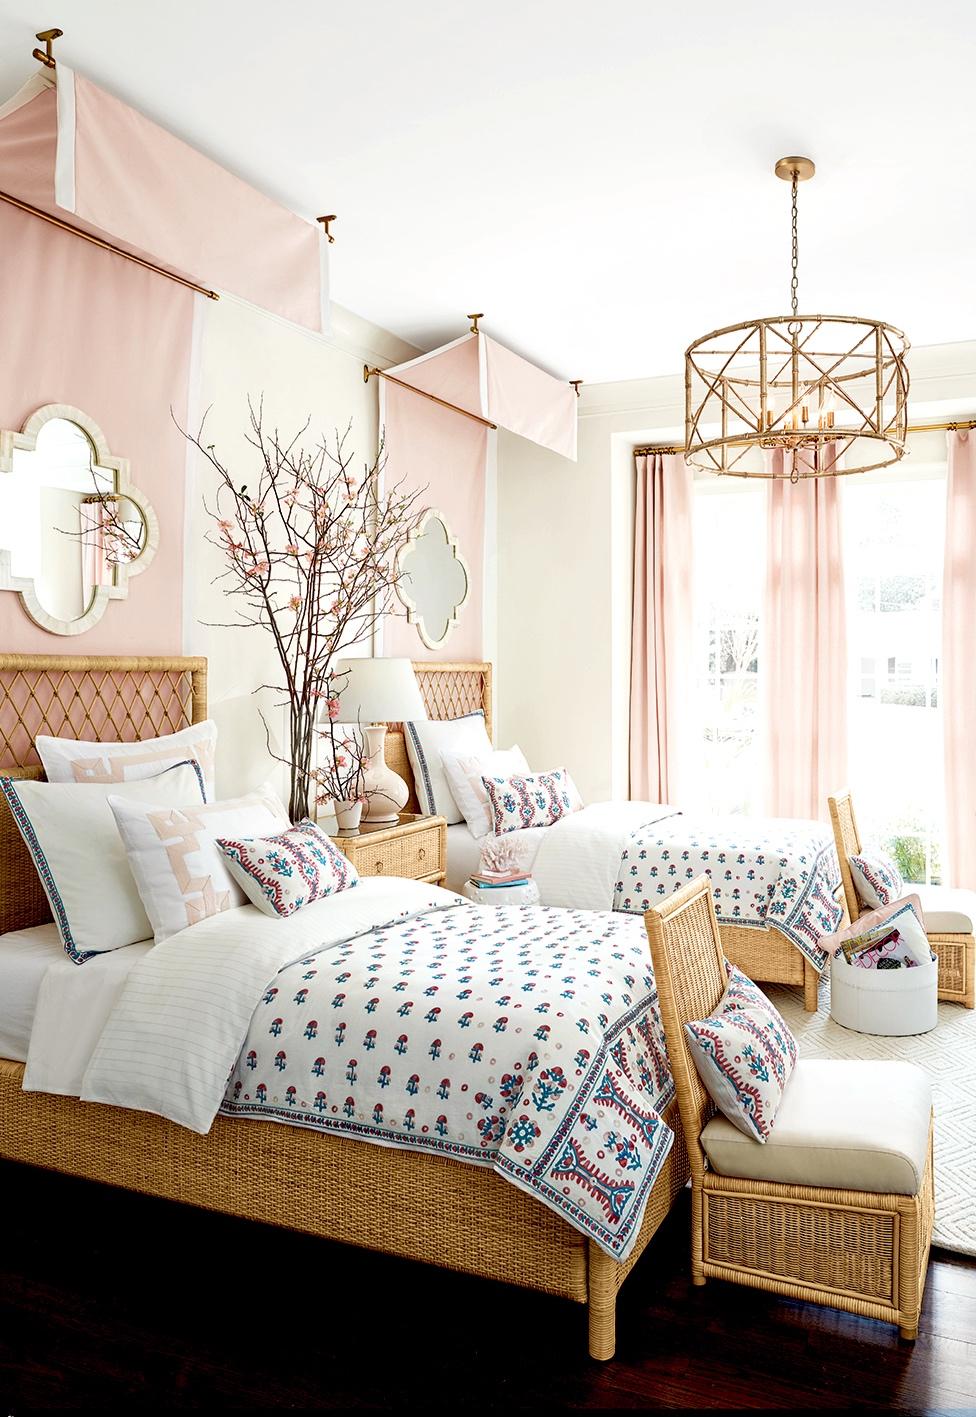 Suzanne Kasler: Bed Styling/Room